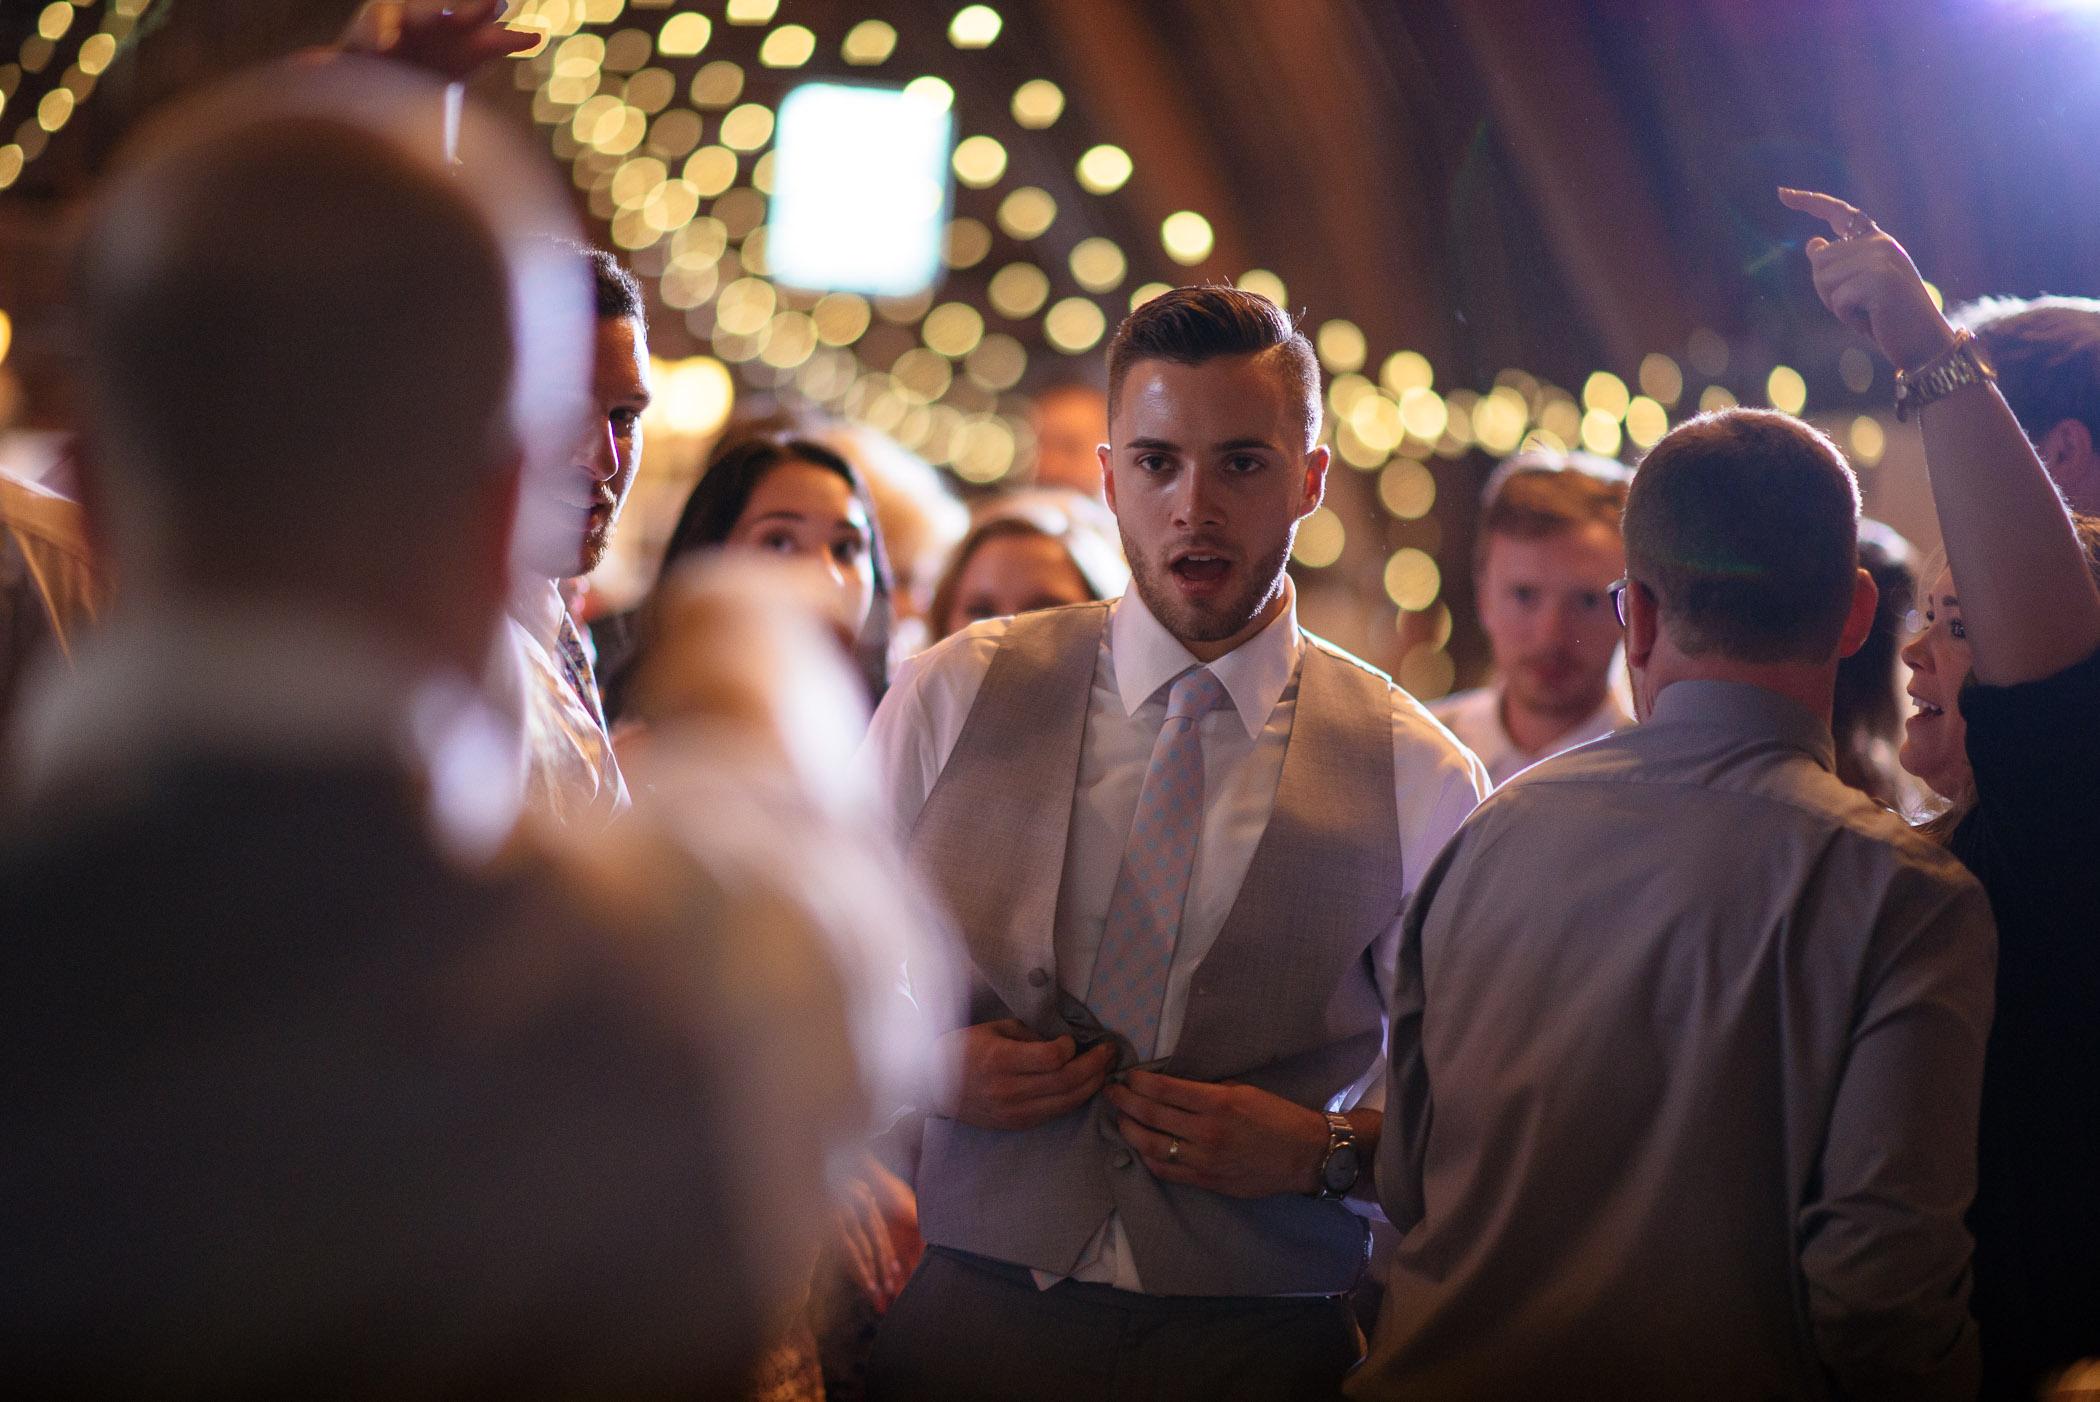 michigan_wedding_at_blue_dress_barn_064.jpg